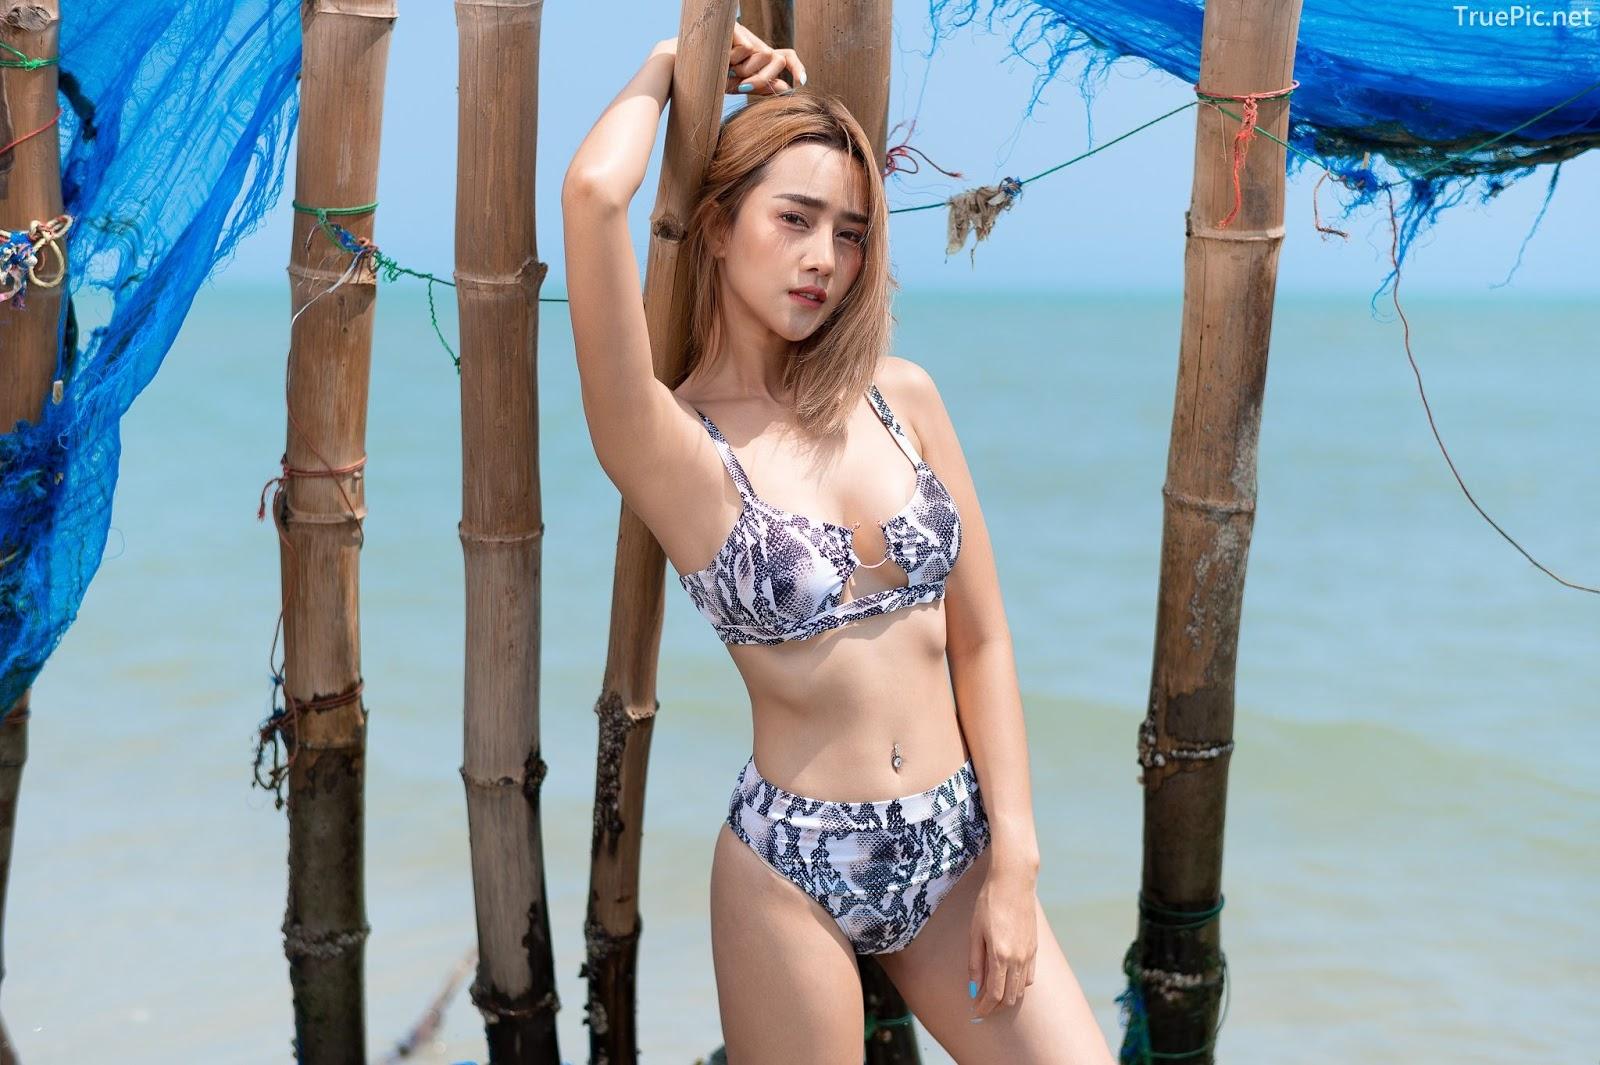 Thailand Hot Model - YingGy Ponjuree - Sea Vibes and Snakeskin Bikini - TruePic.net - Picture 4